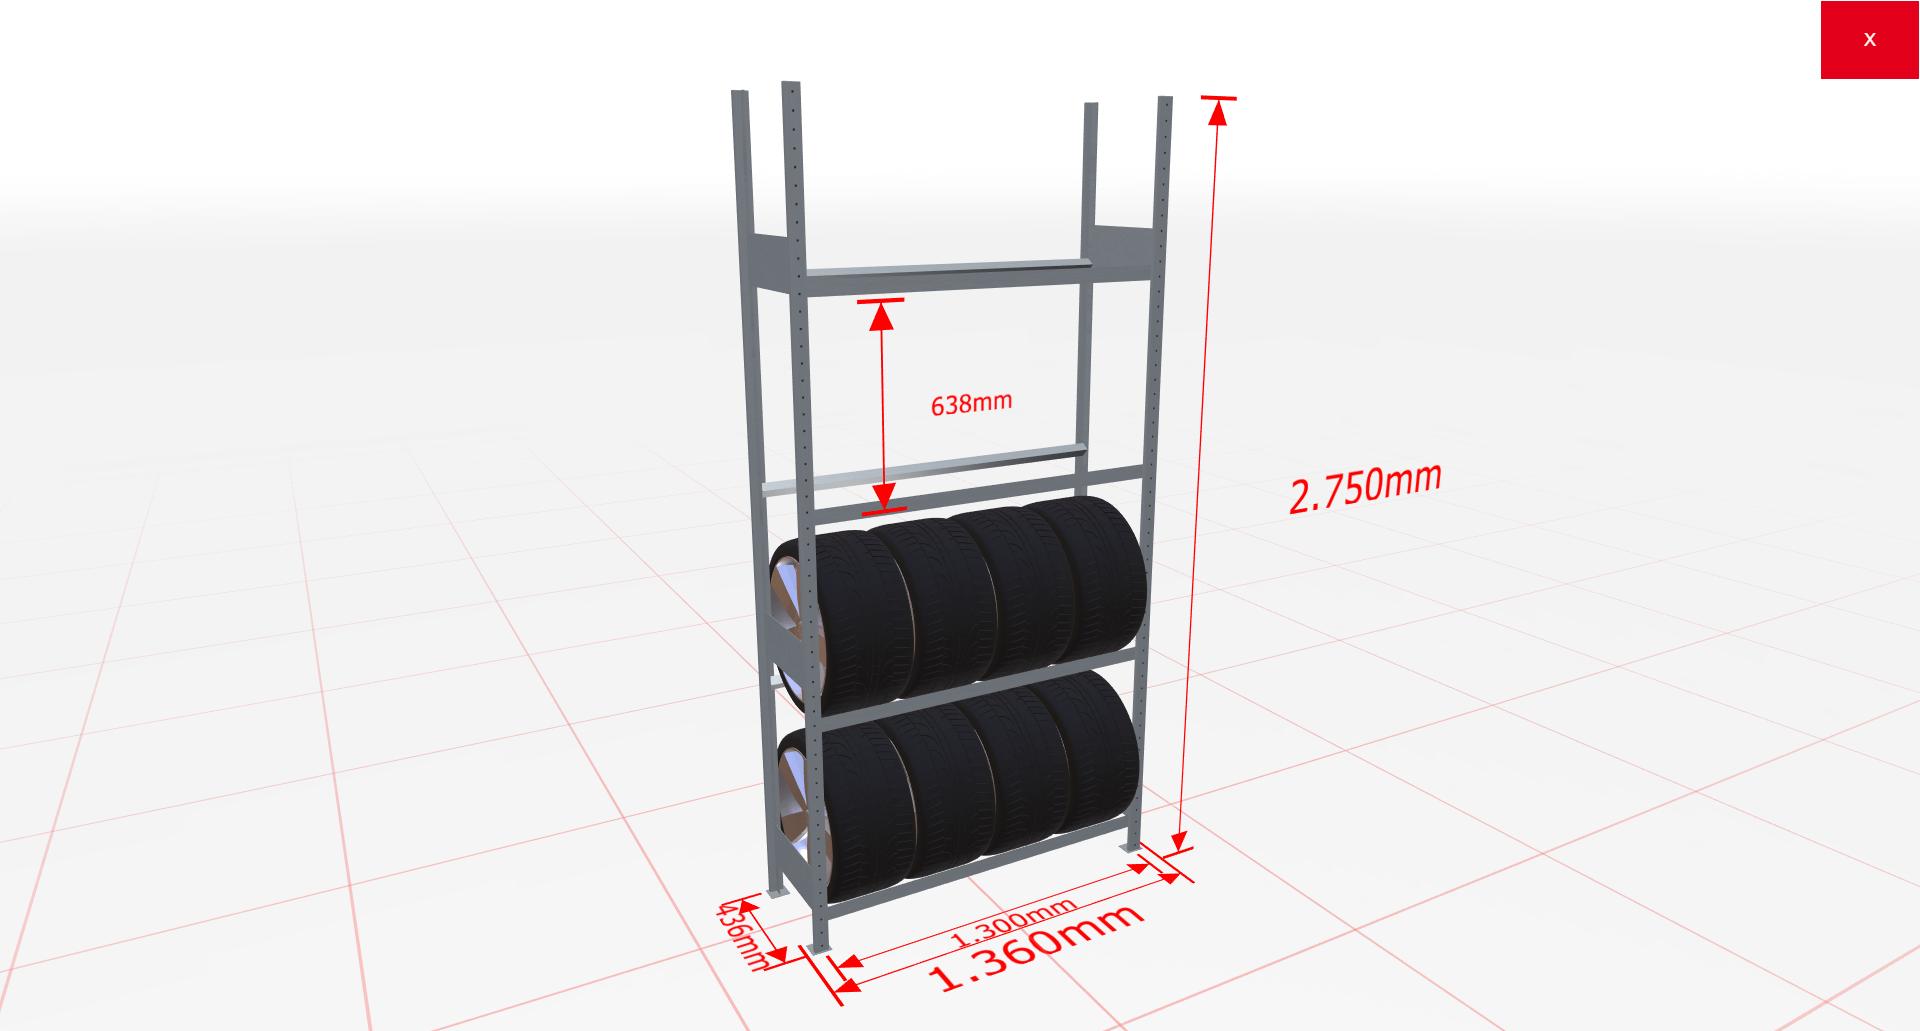 Räderregal Grundregal SCHULTE Lagertechnik 2750x1300x400 mm – 4 Ebenen á 1300 mm, verzinkt